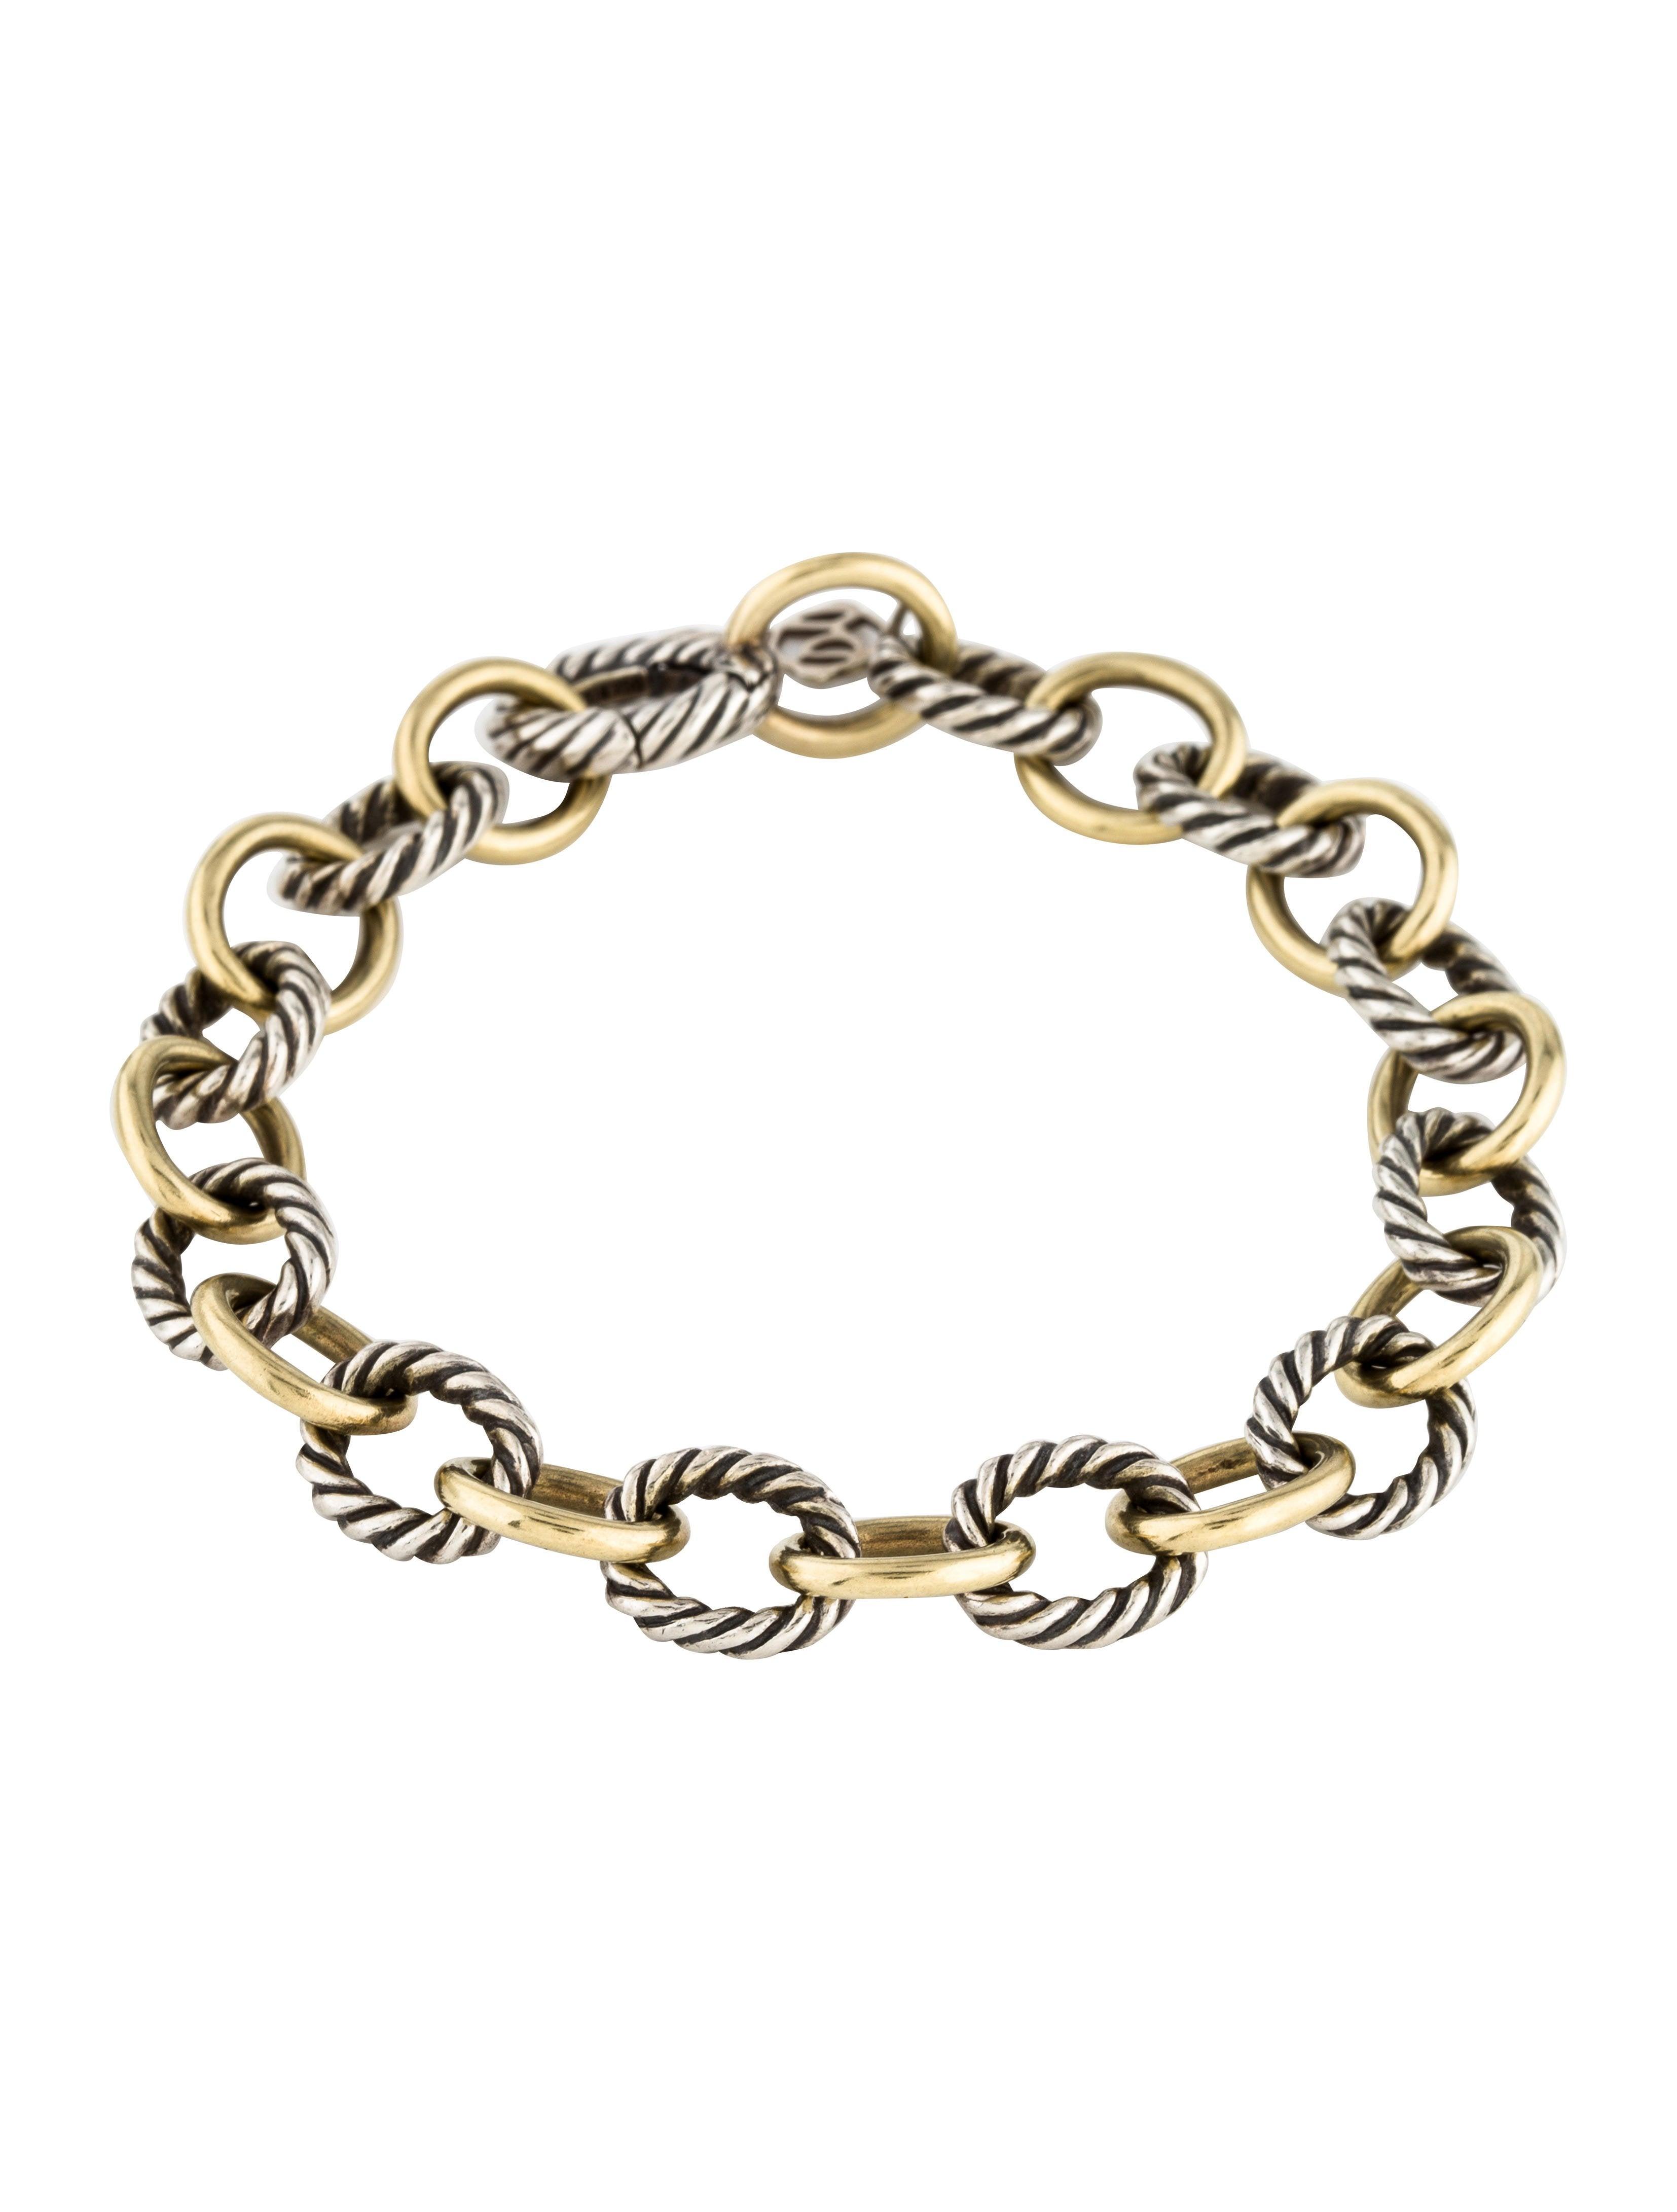 Two Tone Oval Link Bracelet